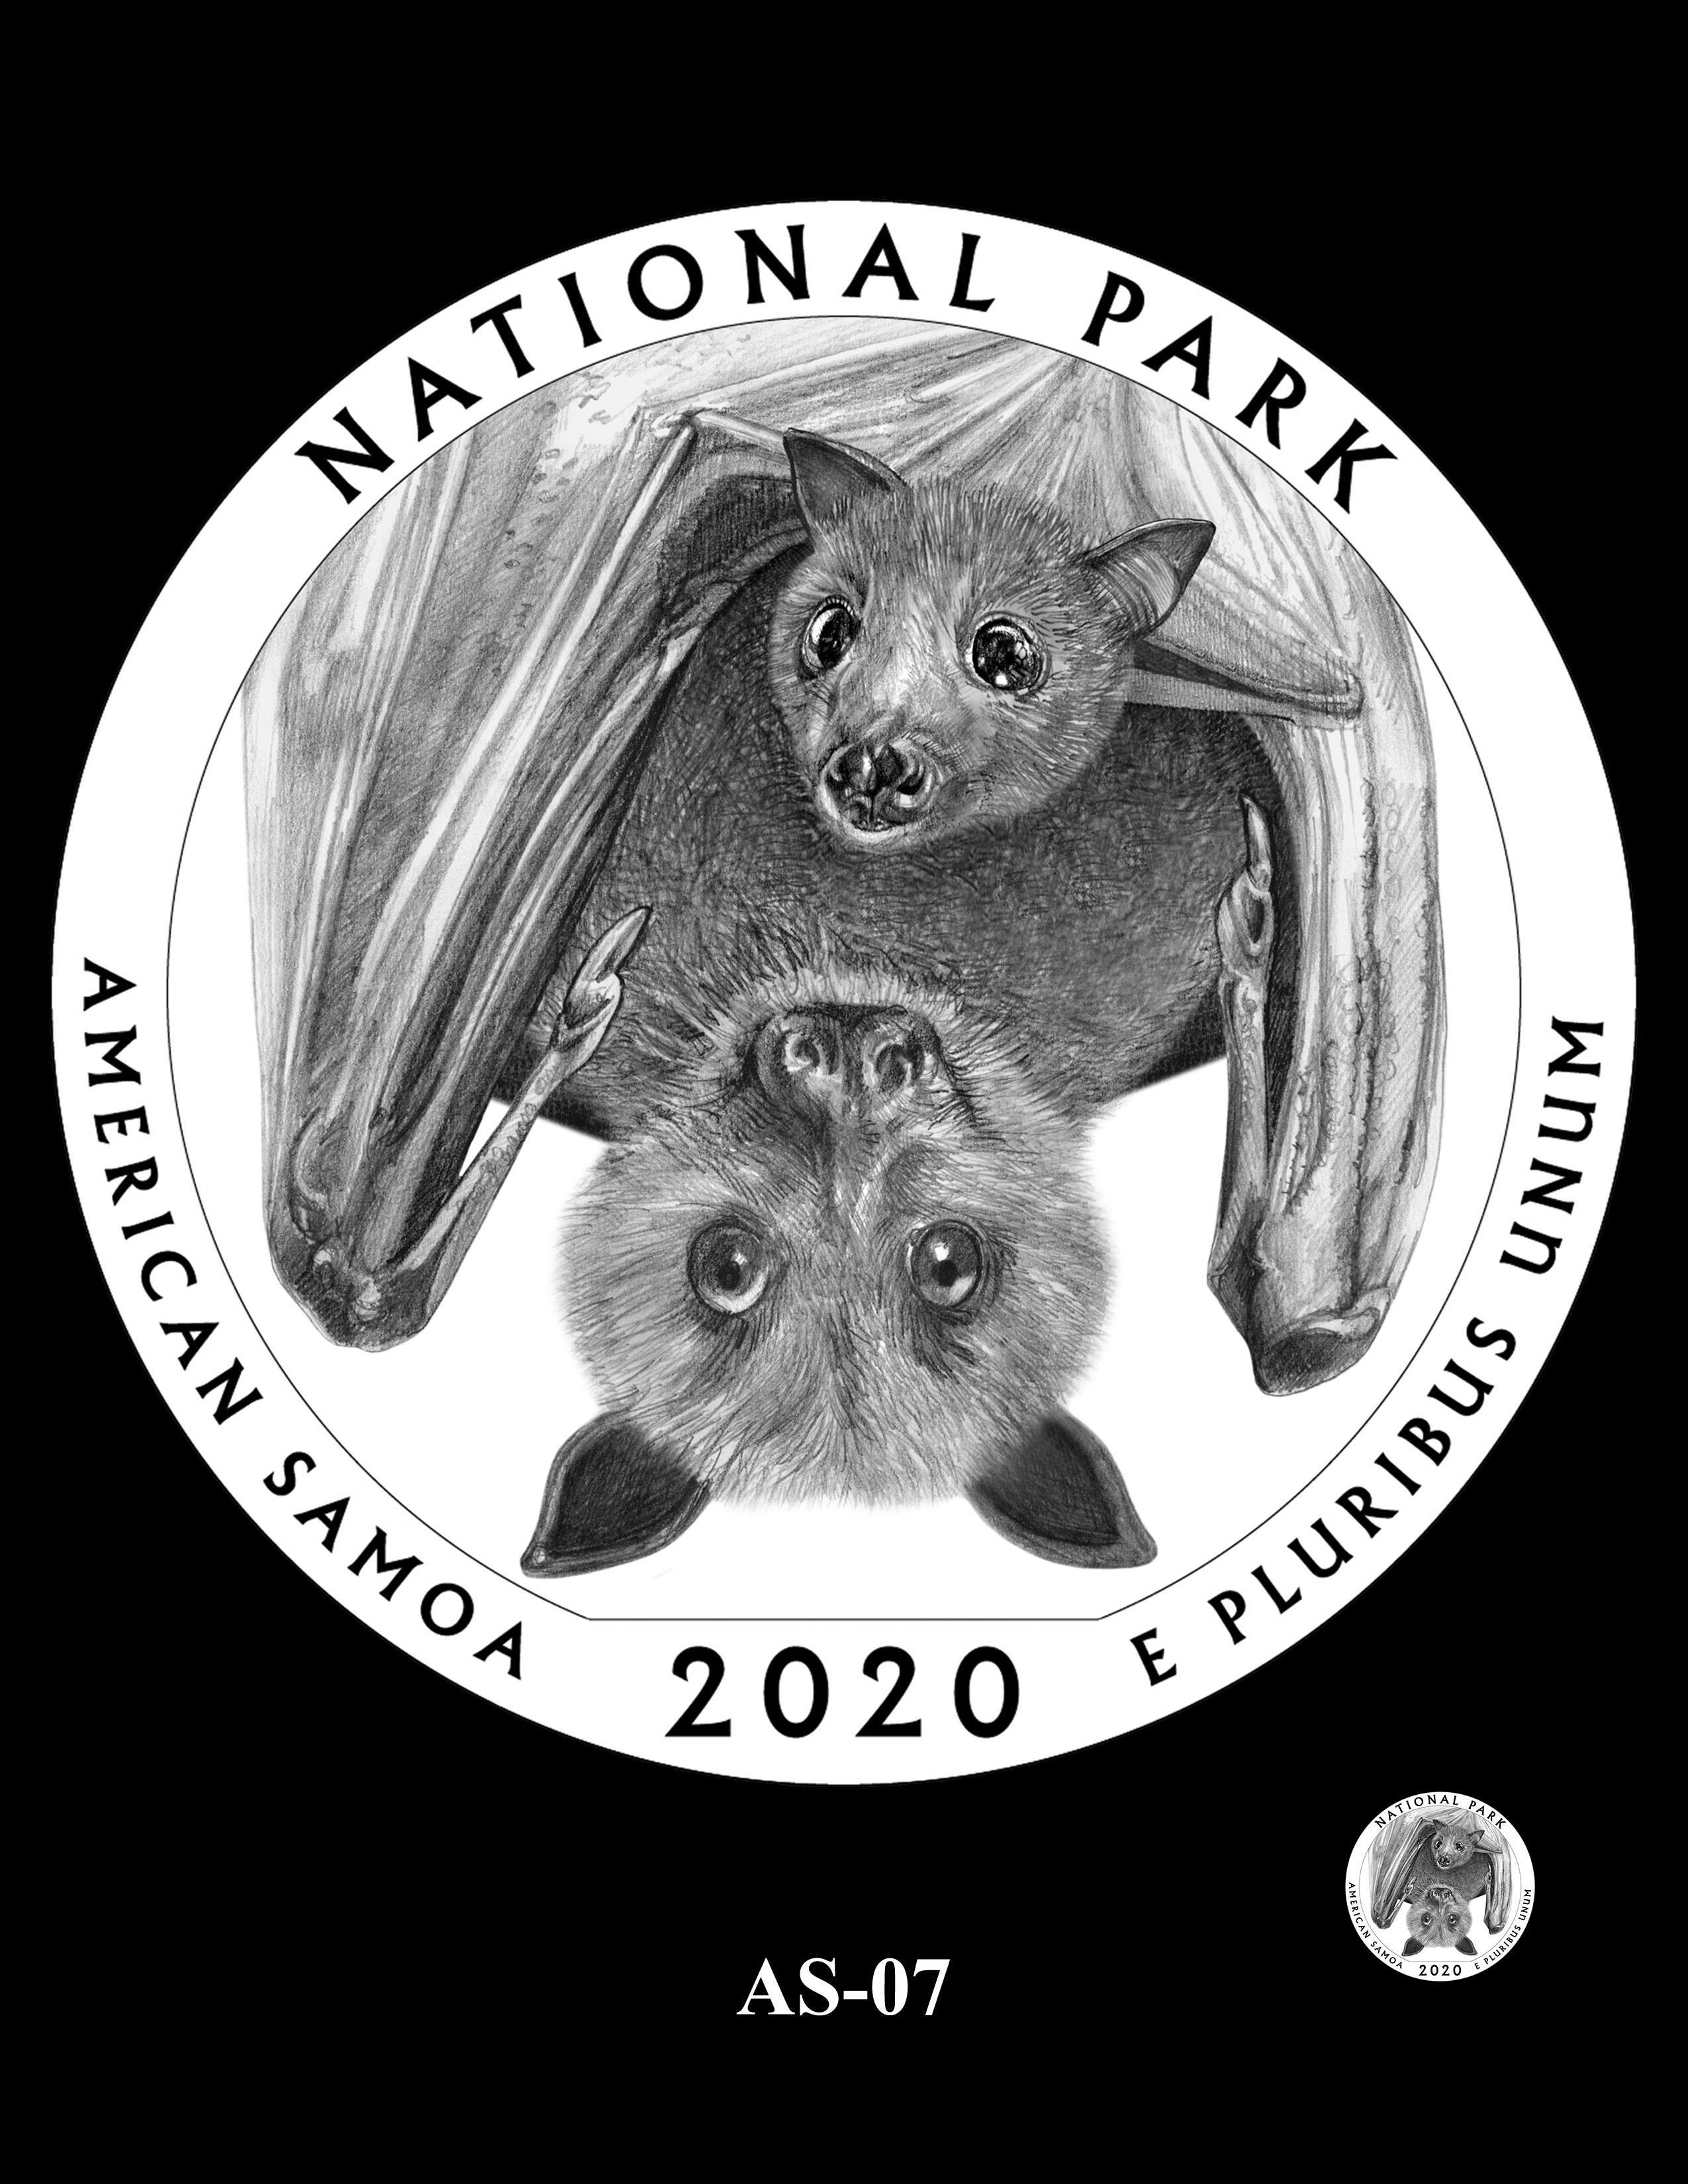 AS-07 -- 2020 America the Beautiful Quarters® Program